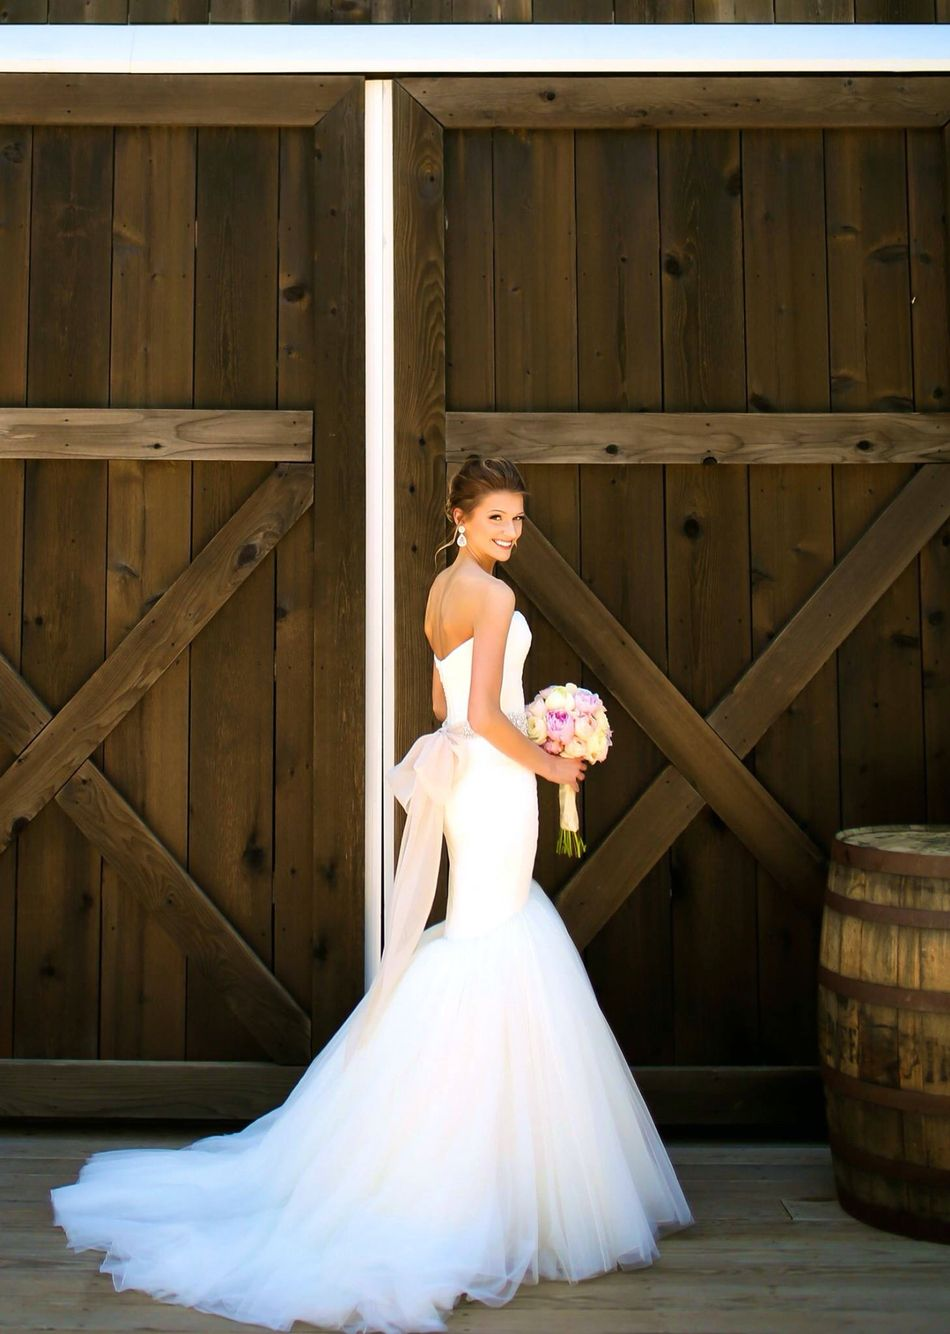 Mark Zunino Mermaid Dress from Kleinfeld Bridal | Dream Wedding ...